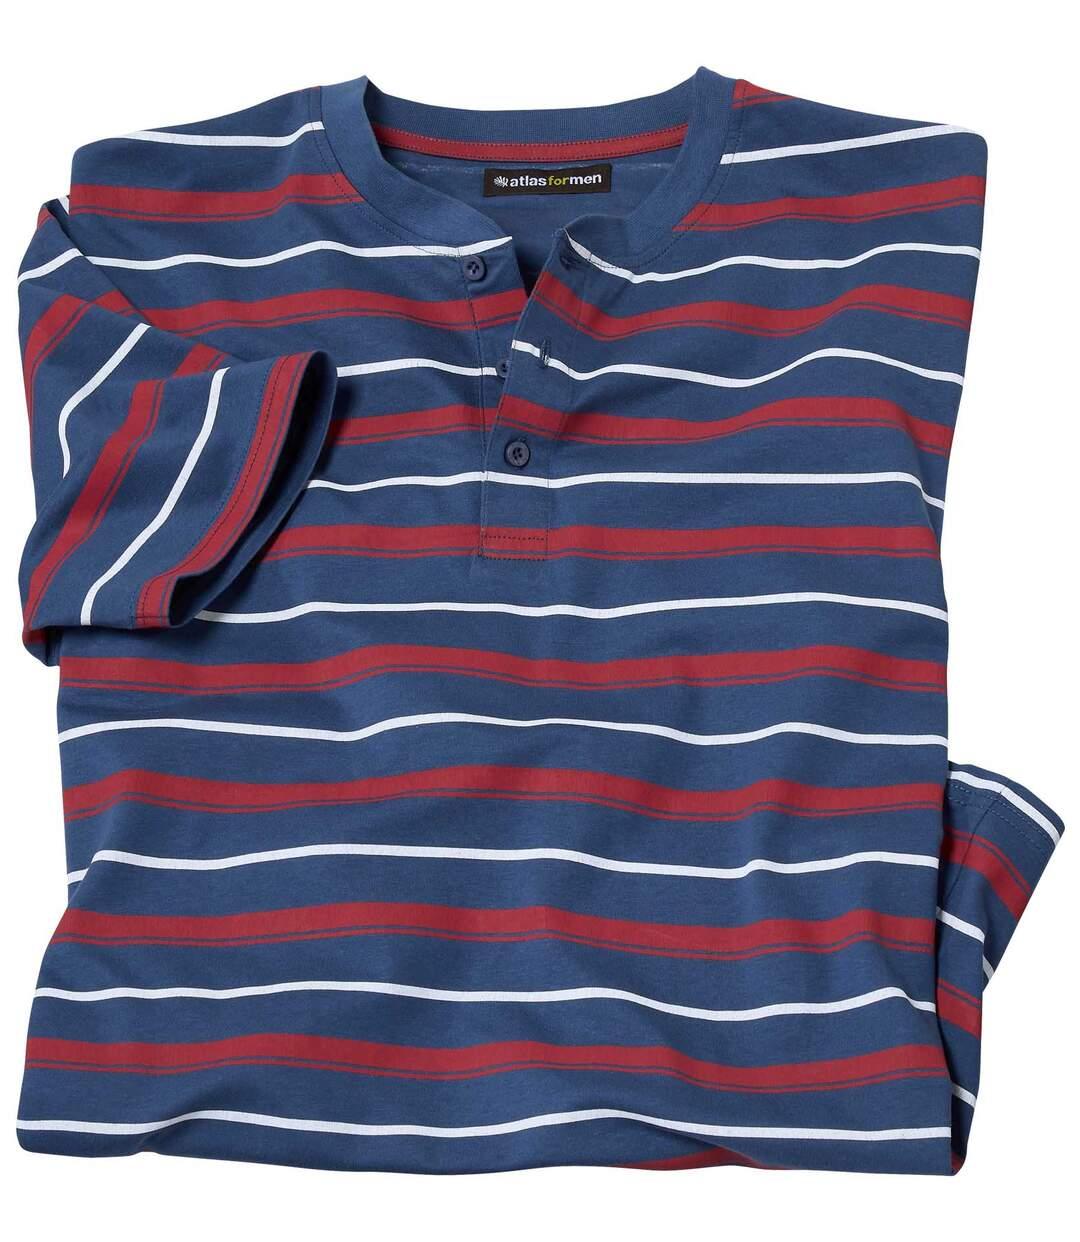 Henleyshirt im Matrosenlook